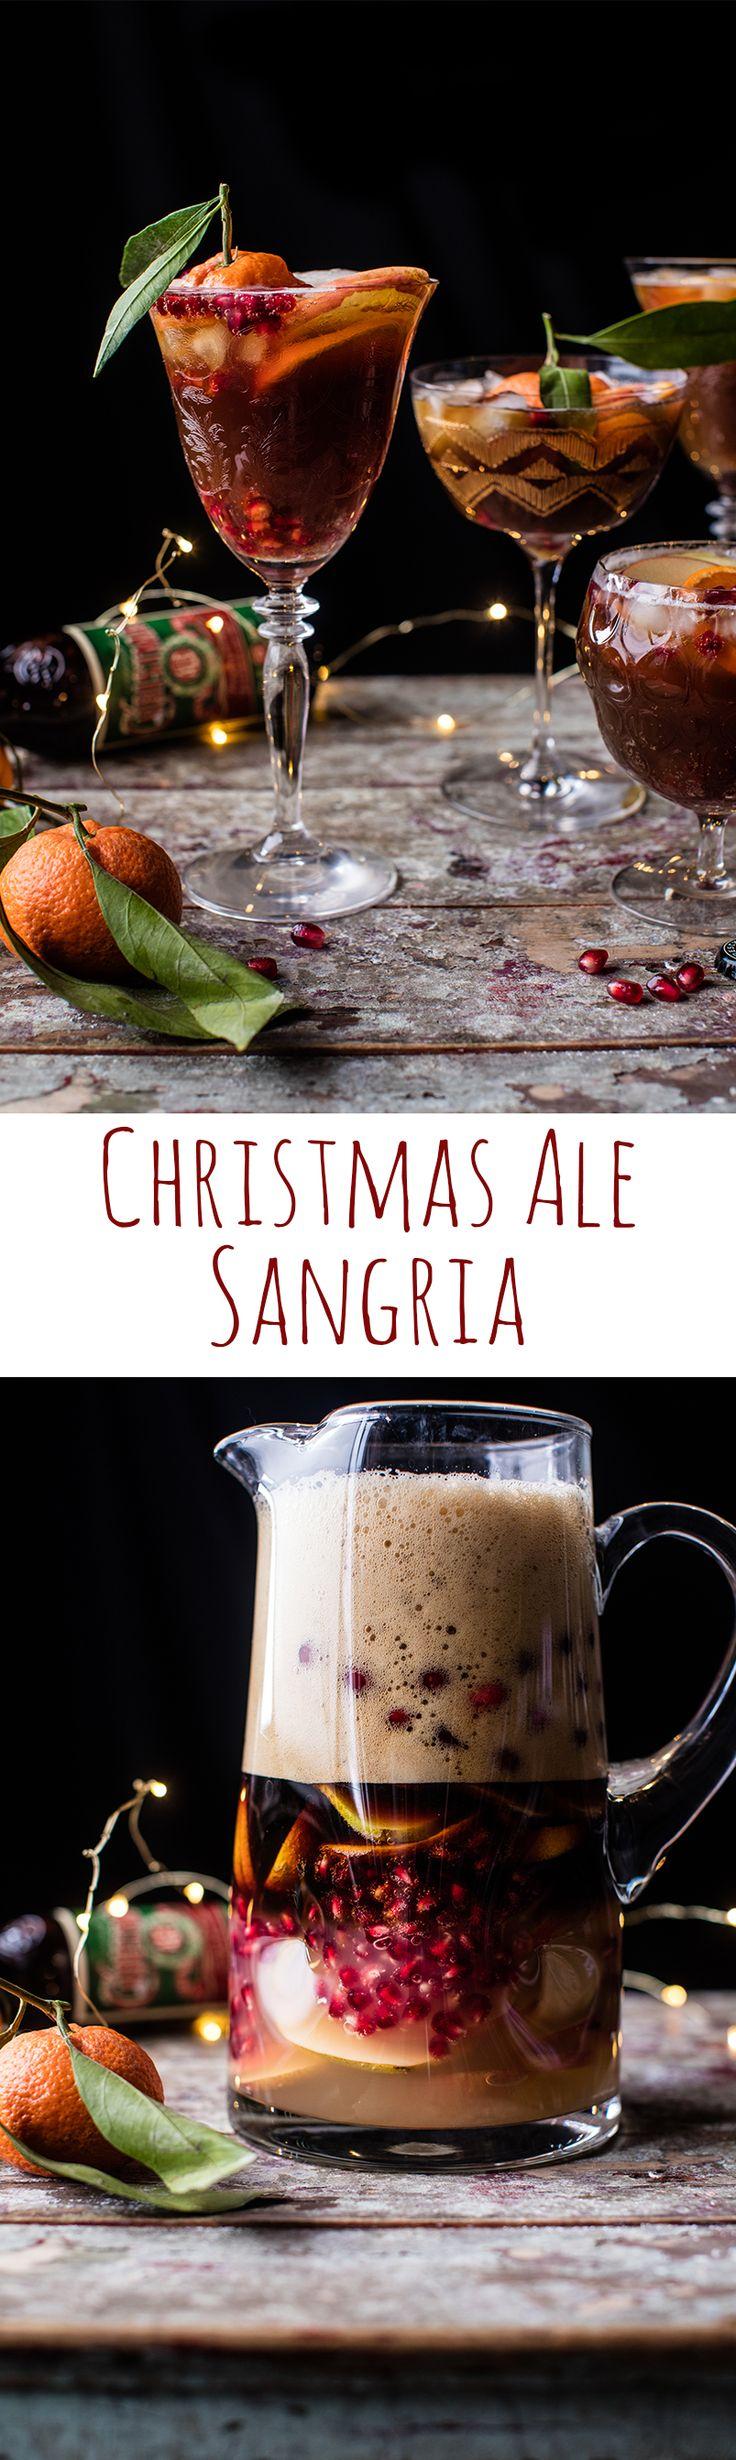 Christmas Ale Sangria | halfbakedharvest.com @hbharvest